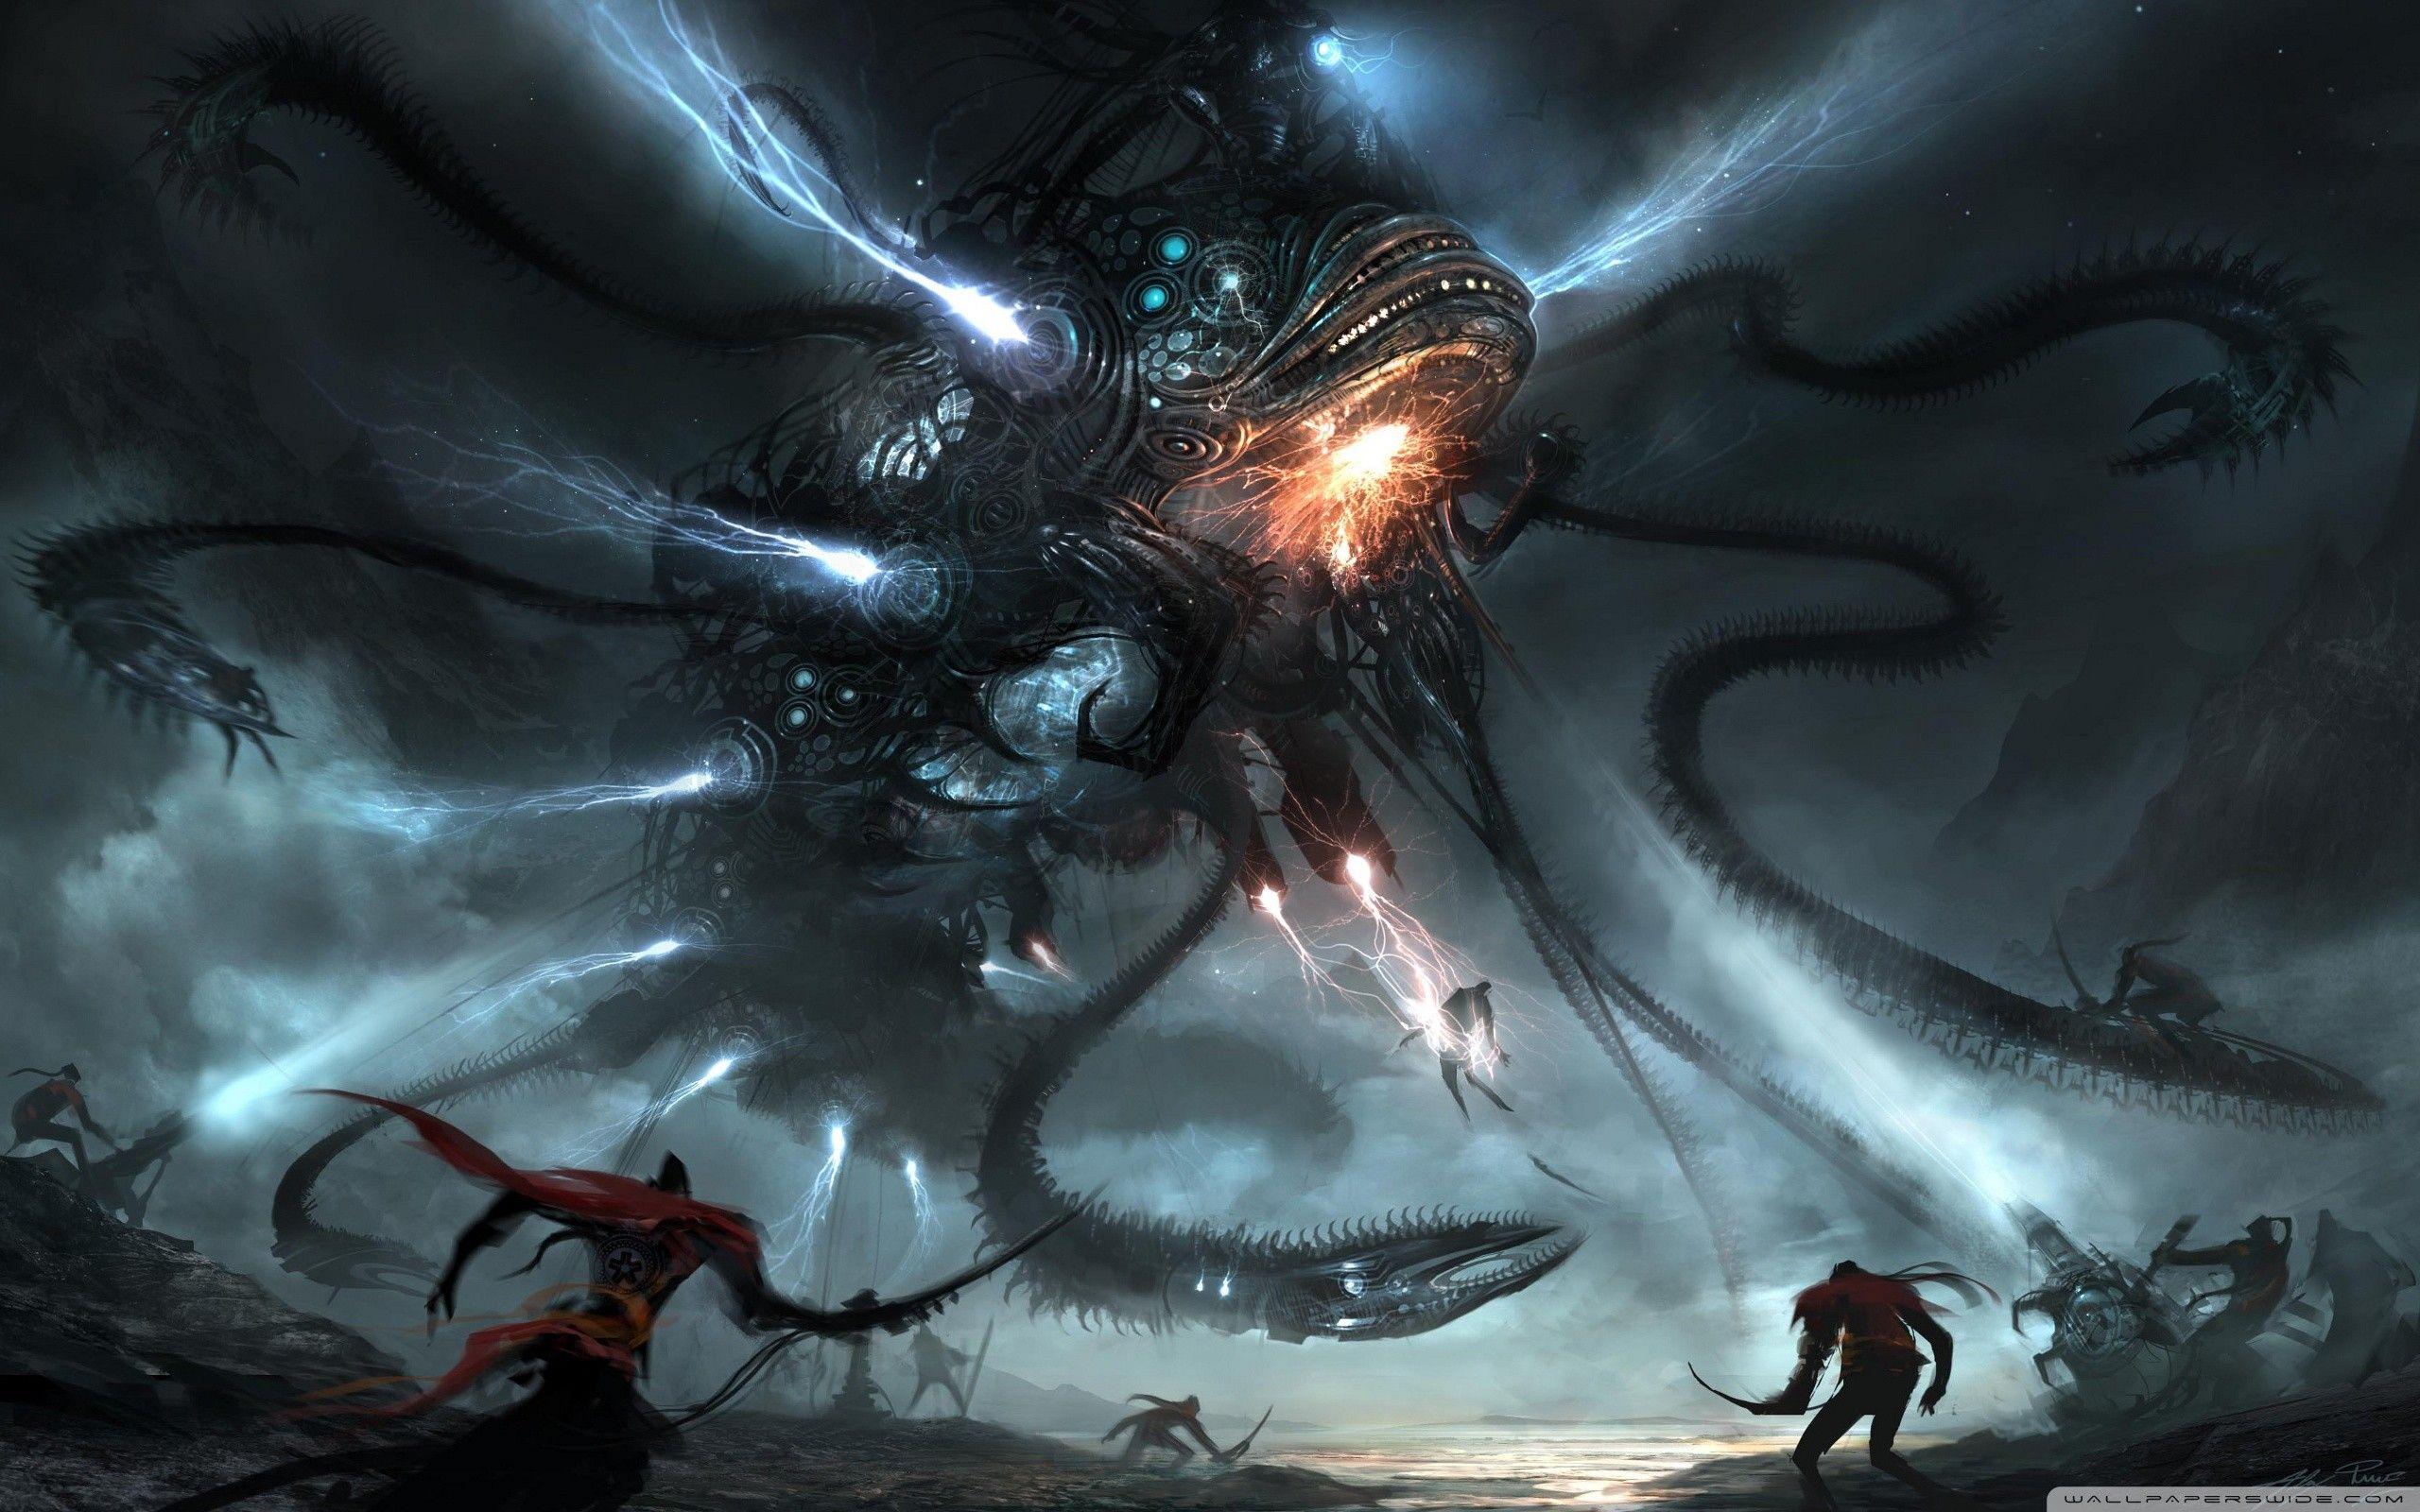 Alien Space Battle Wallpaper Jpg 2560 1600 Dark Fantasy Art Fantasy Art Art